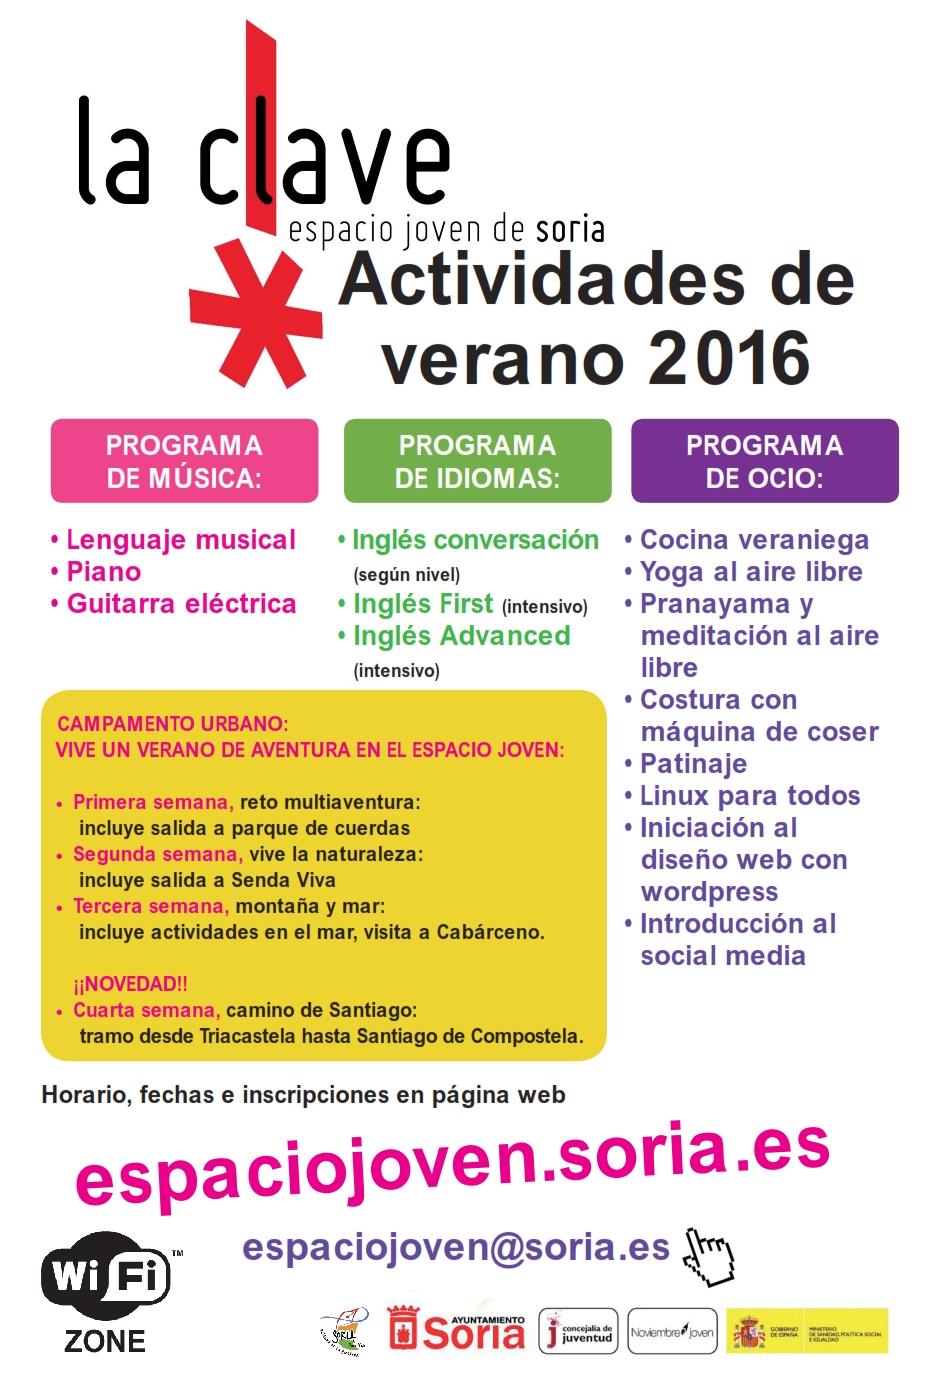 ACTIVIDADES DE VERANO 2016